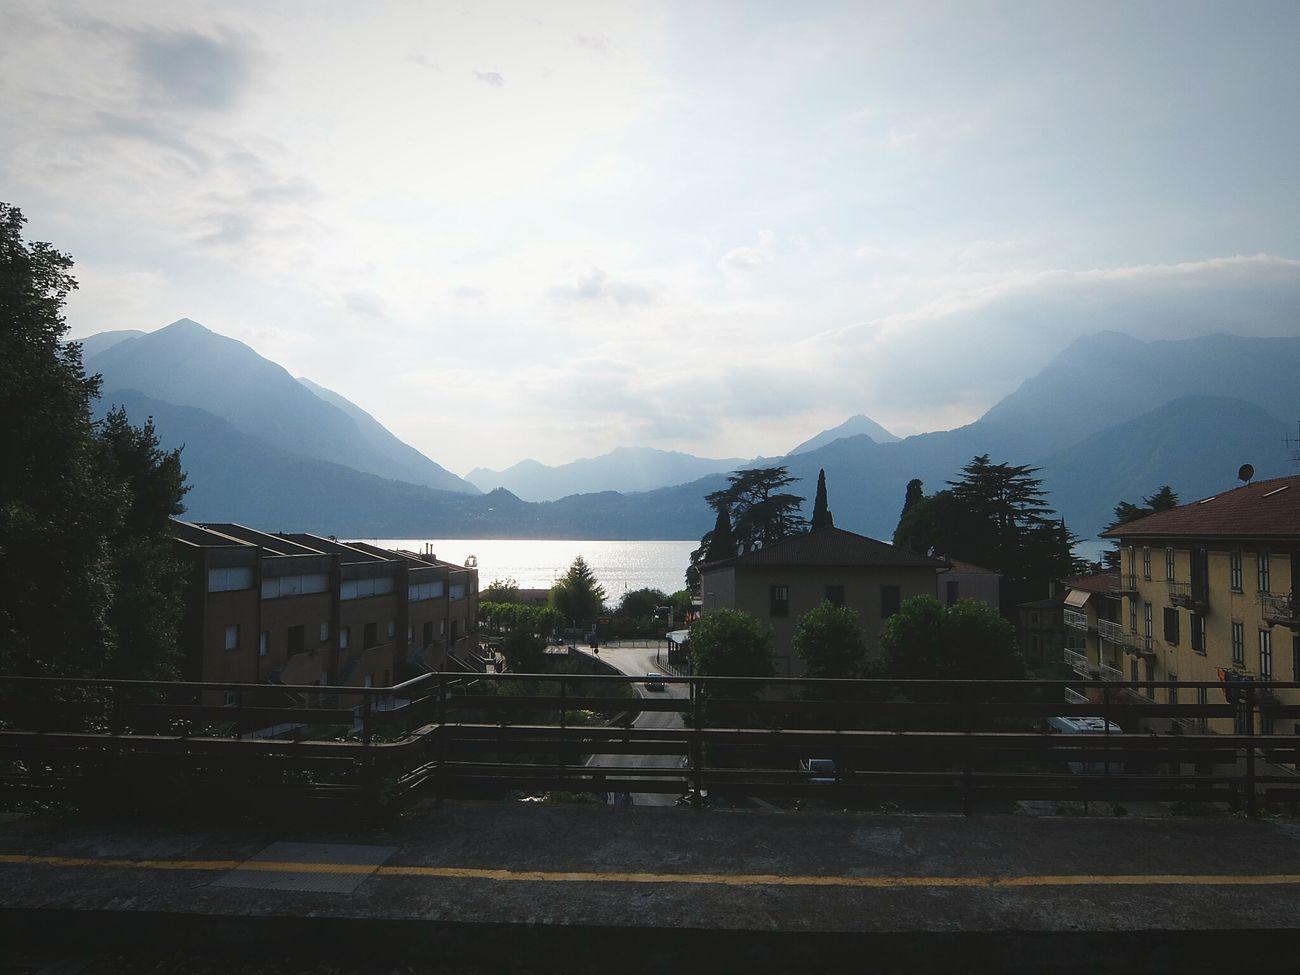 Bellagio Lago Di Como Lake Como Mountains Mountain Lake On The Train Train Station Fujifilm